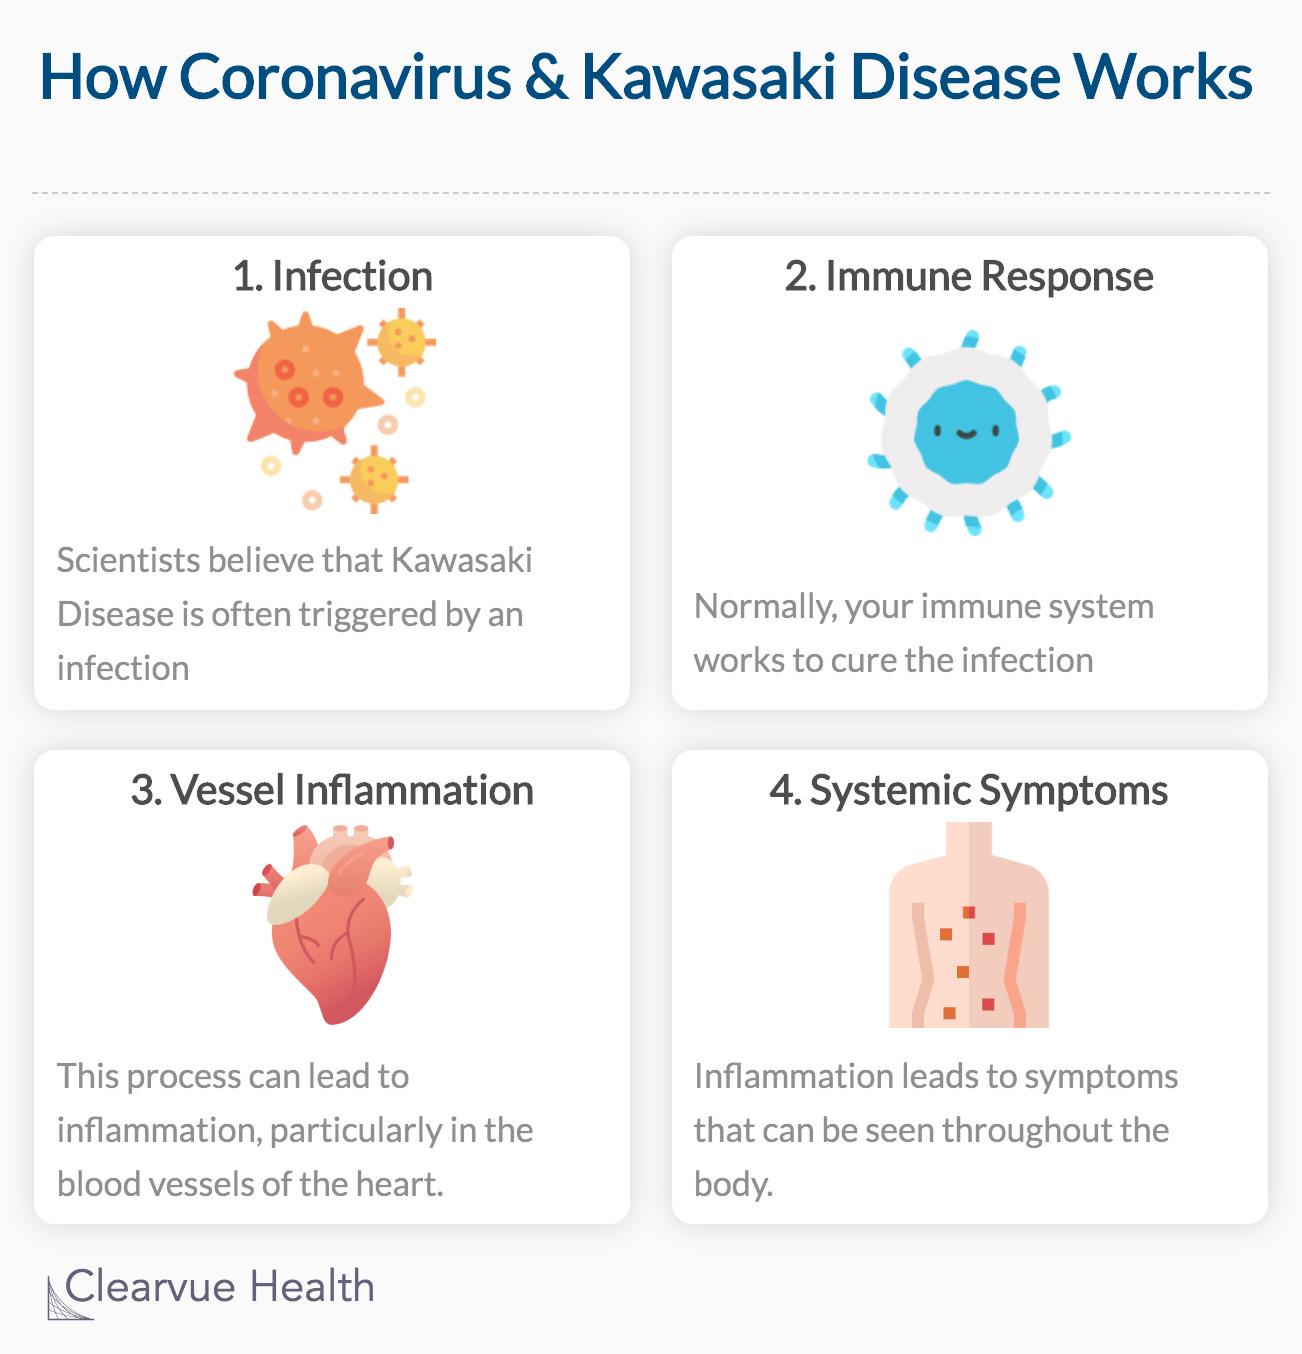 How Coronavirus & Kawasaki Disease Works